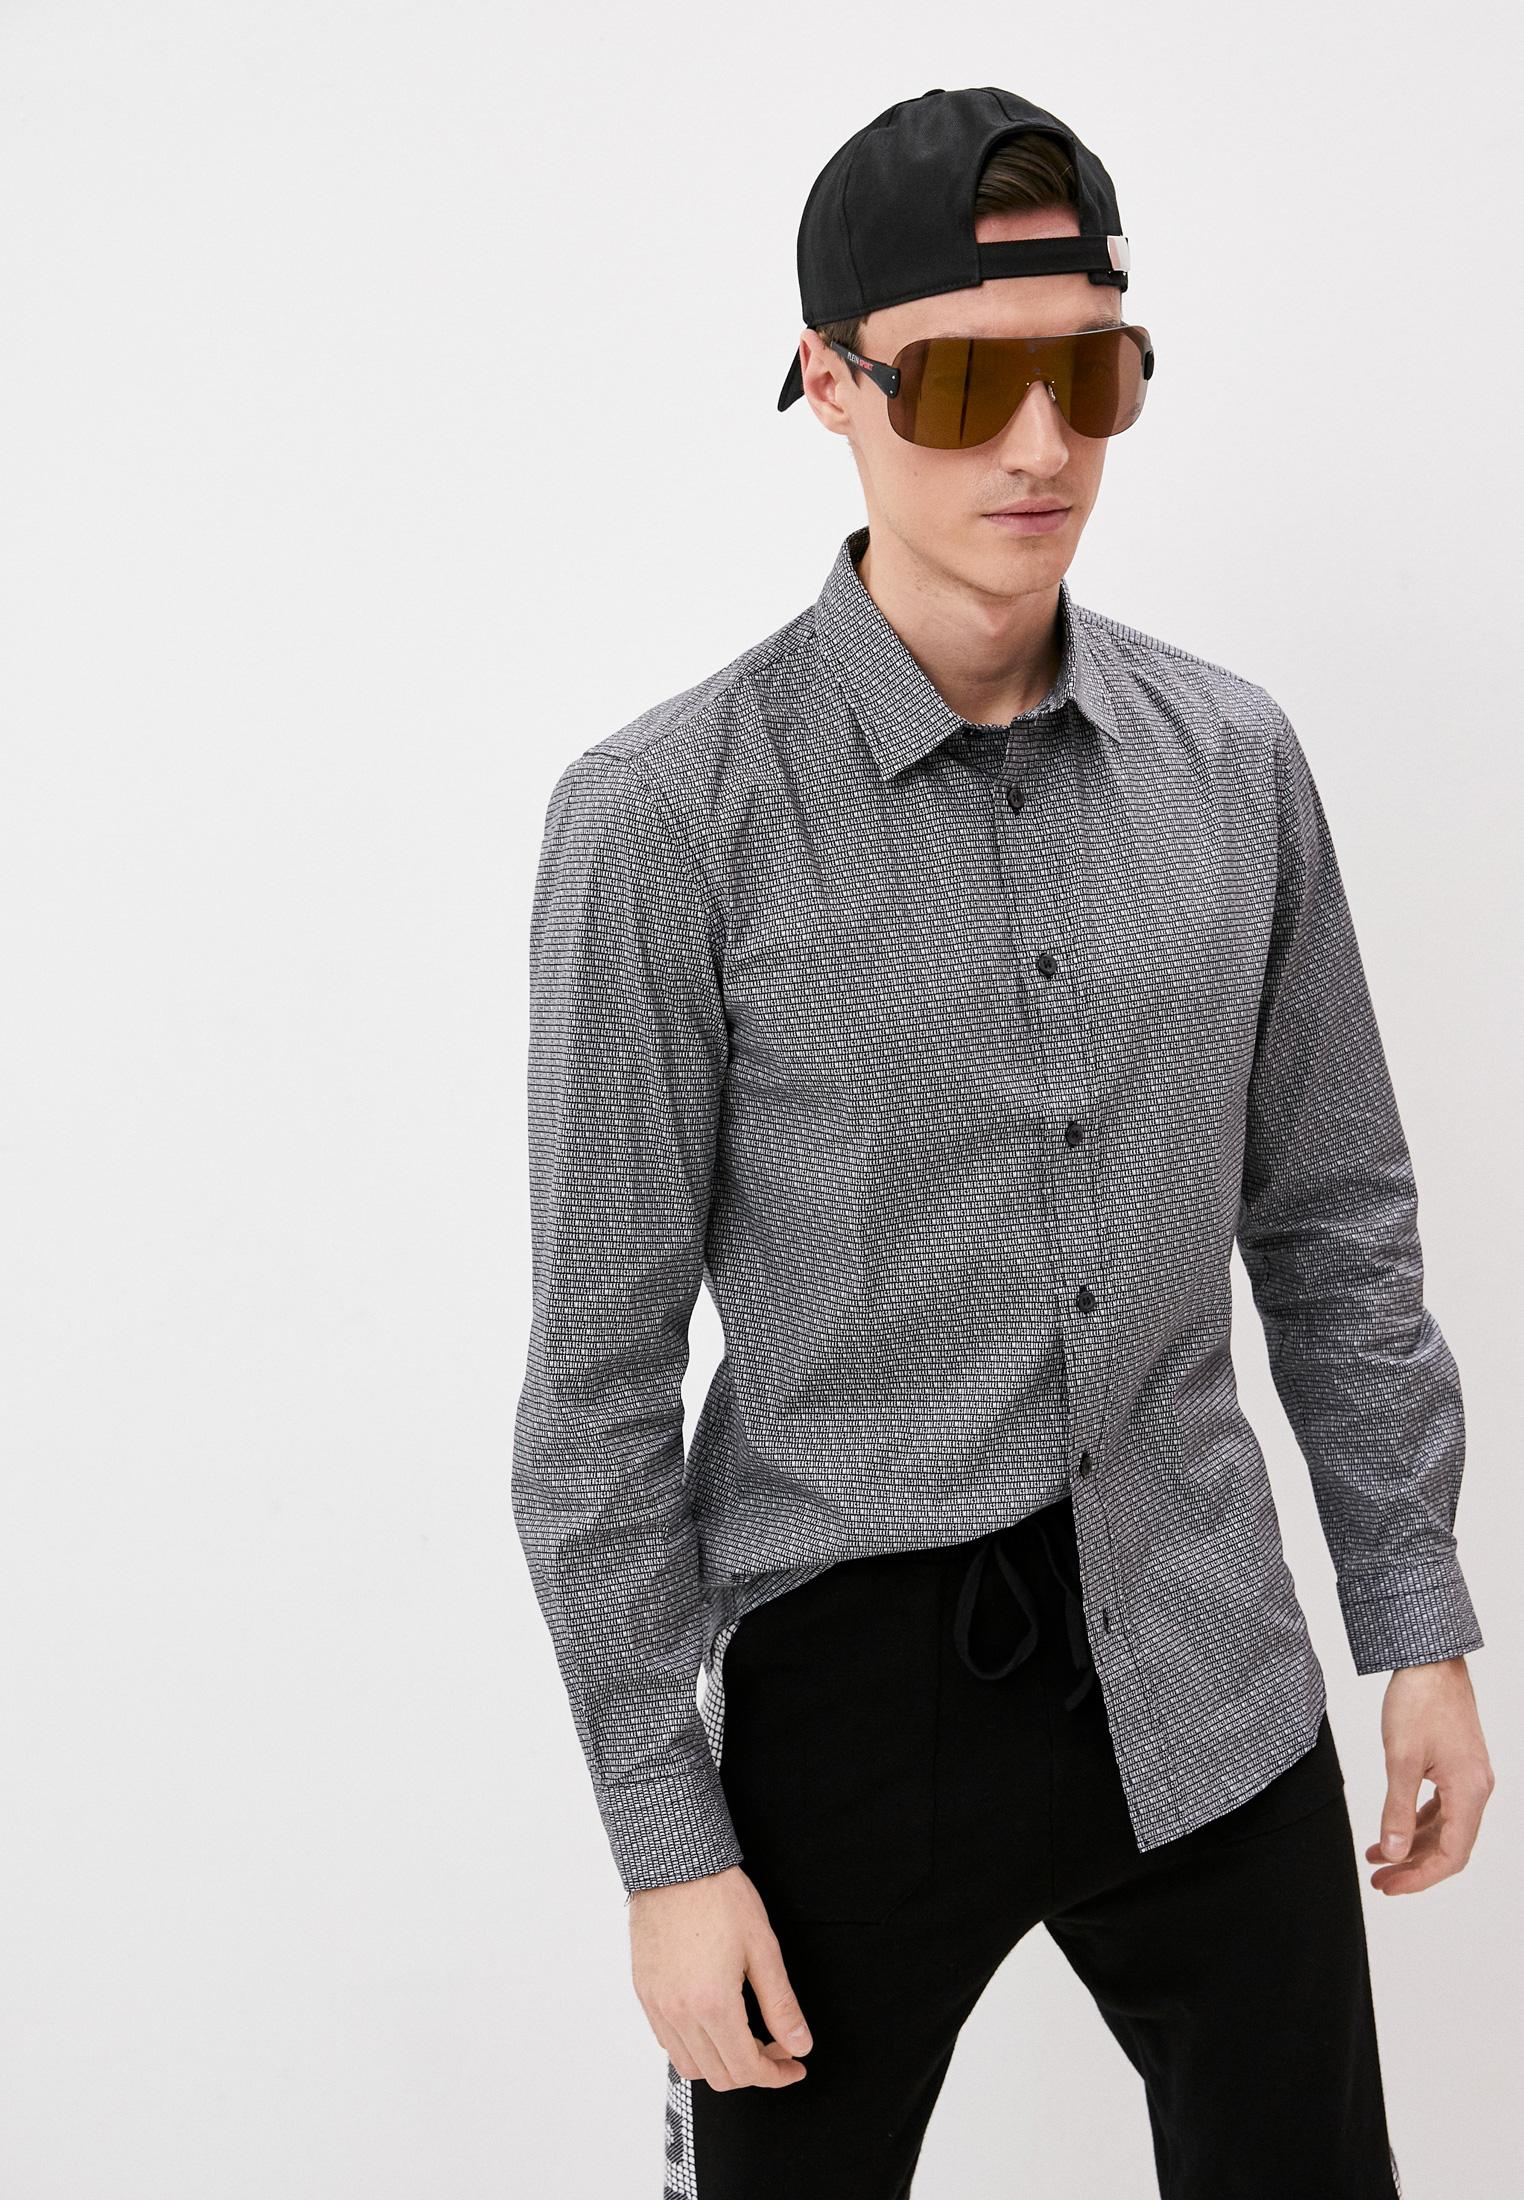 Рубашка с длинным рукавом Bikkembergs (Биккембергс) CC00900S33530034